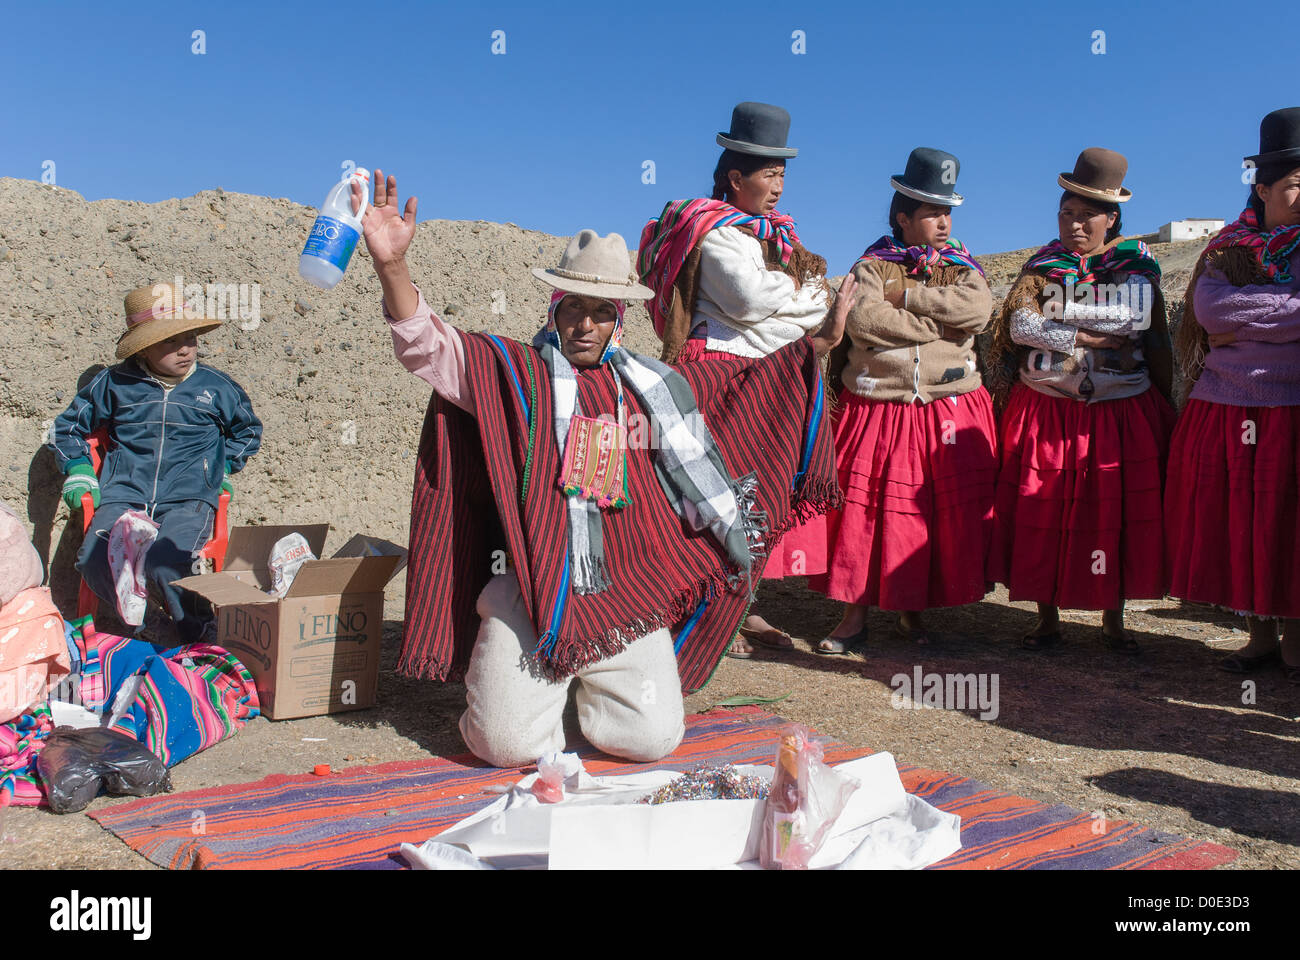 Ceremony to the Pachamama in the  bolivian cordillera Stock Photo